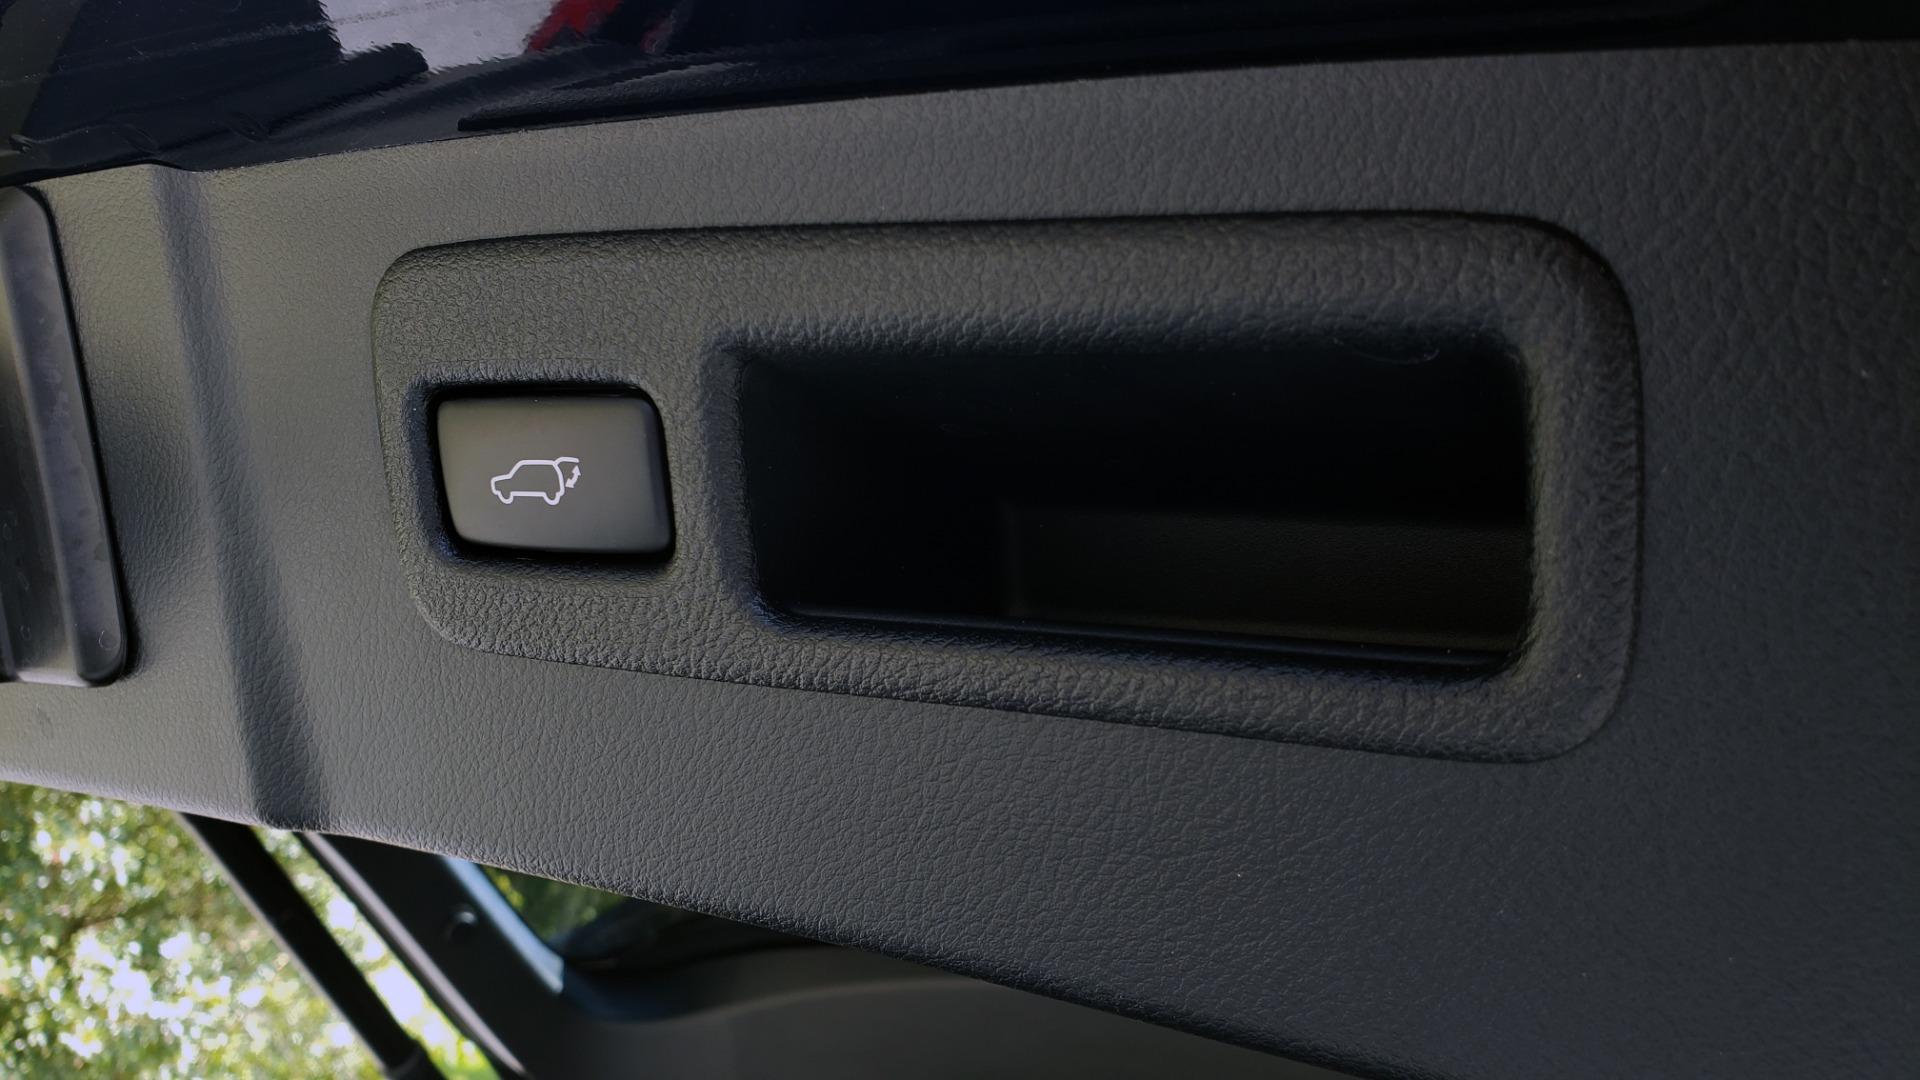 Used 2016 Lexus NX 200T PREM PKG / NAV / SUNROOF / PRE-COLLISION / PARK ASST for sale Sold at Formula Imports in Charlotte NC 28227 19